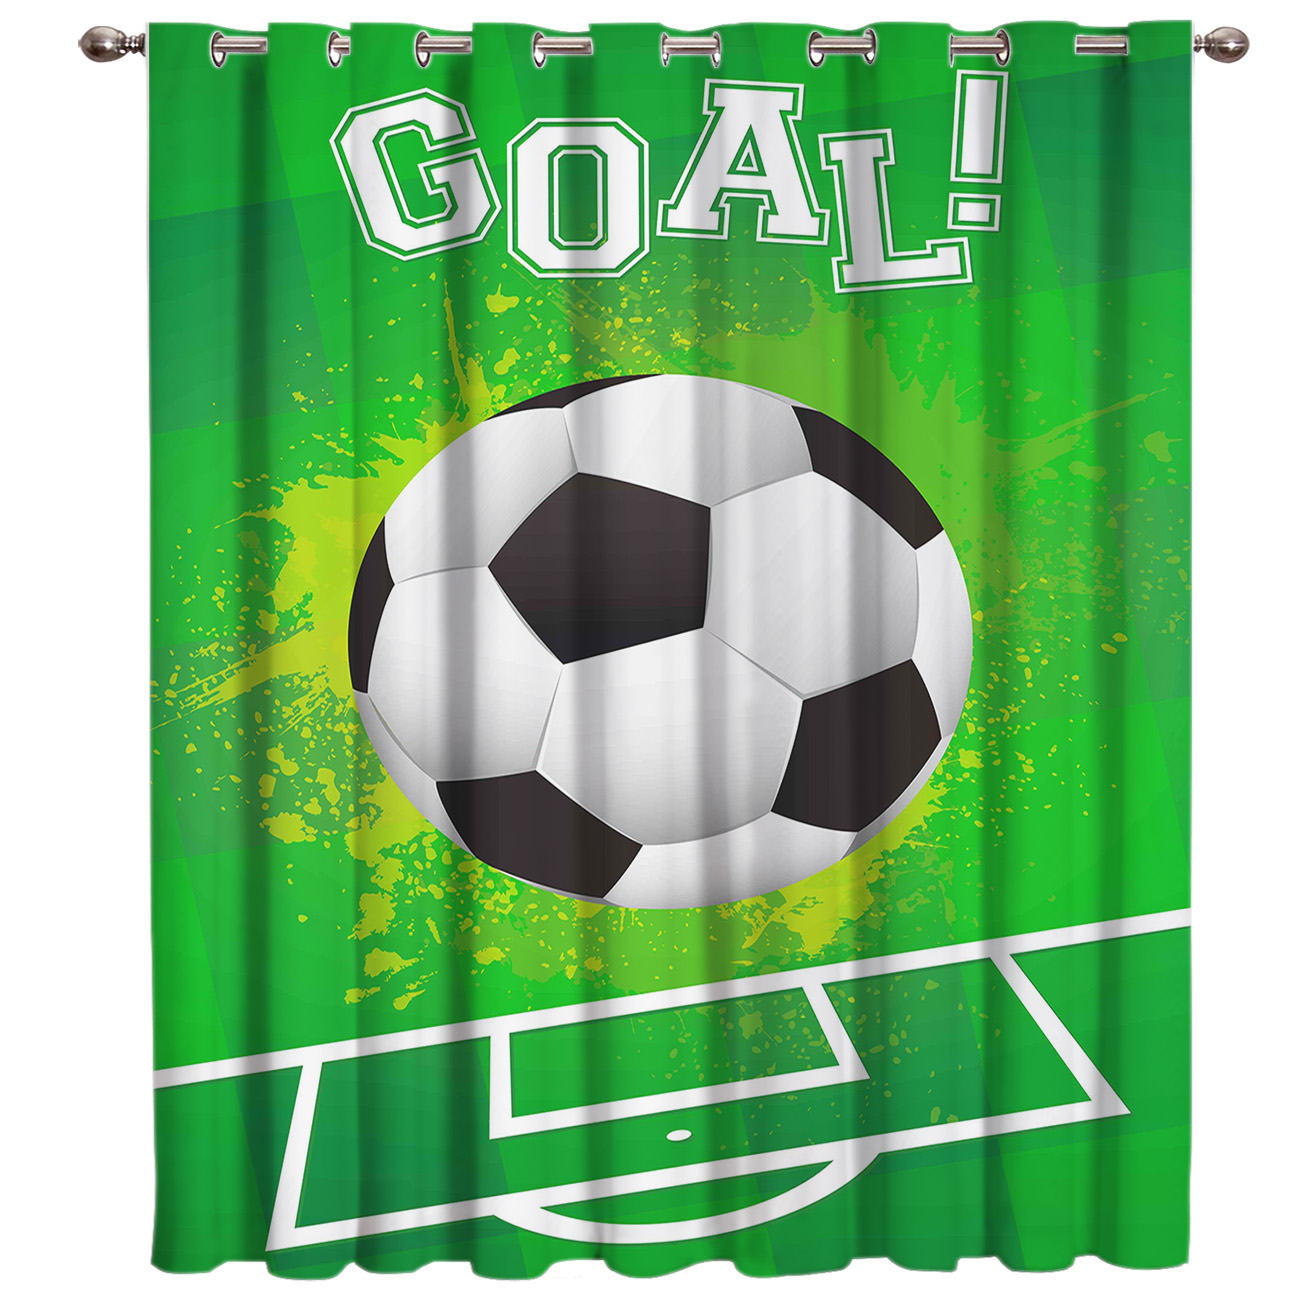 Soccer Curtains Balls Football Design 3D Window Curtains For Living Room Bedroom Kitchen Cortinas Para Sala De Estar Polyester